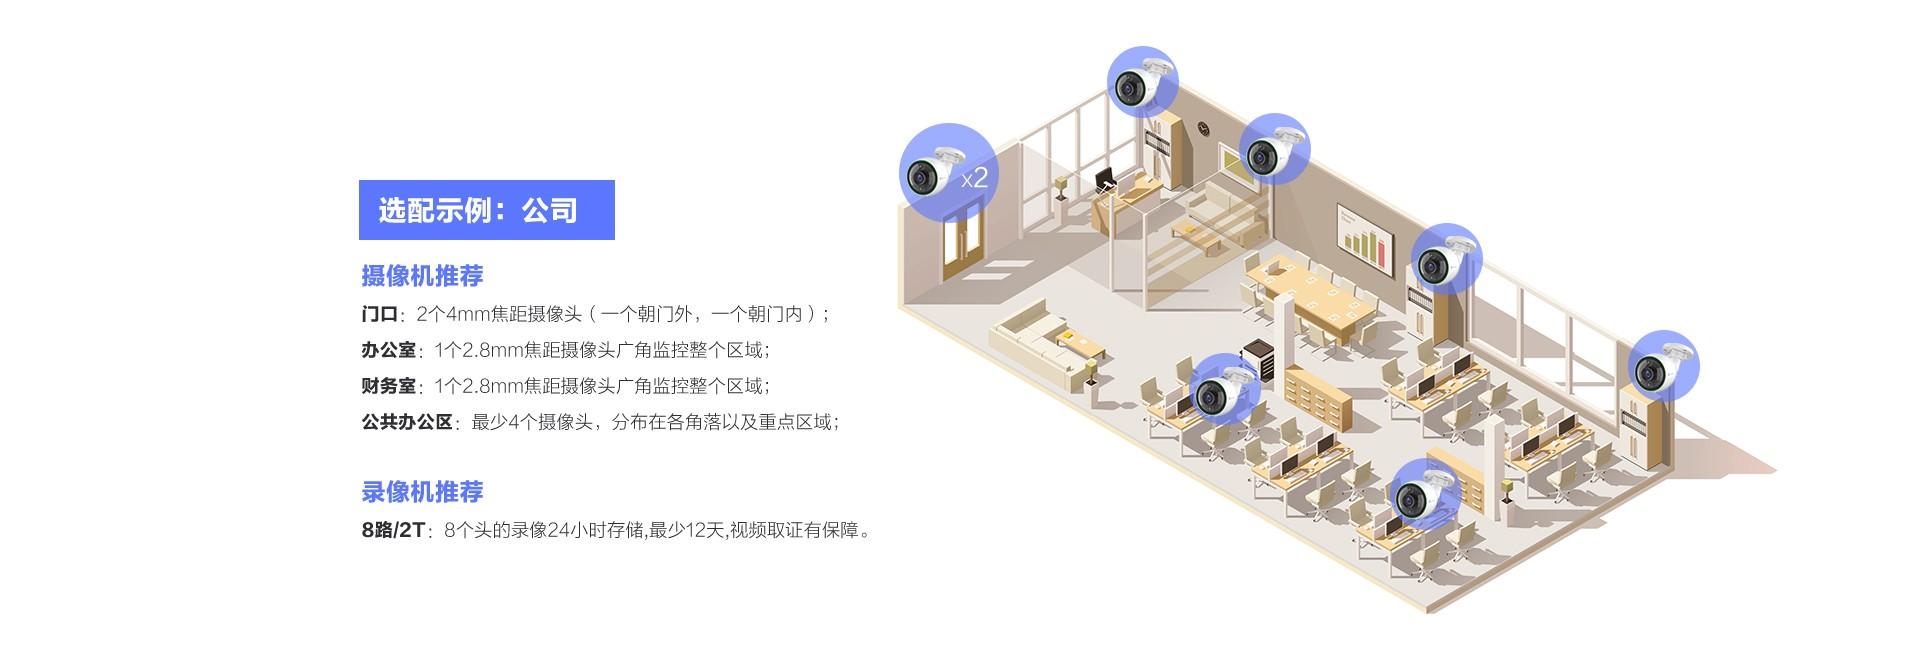 C3CPOE+X5SC-web_33.jpg